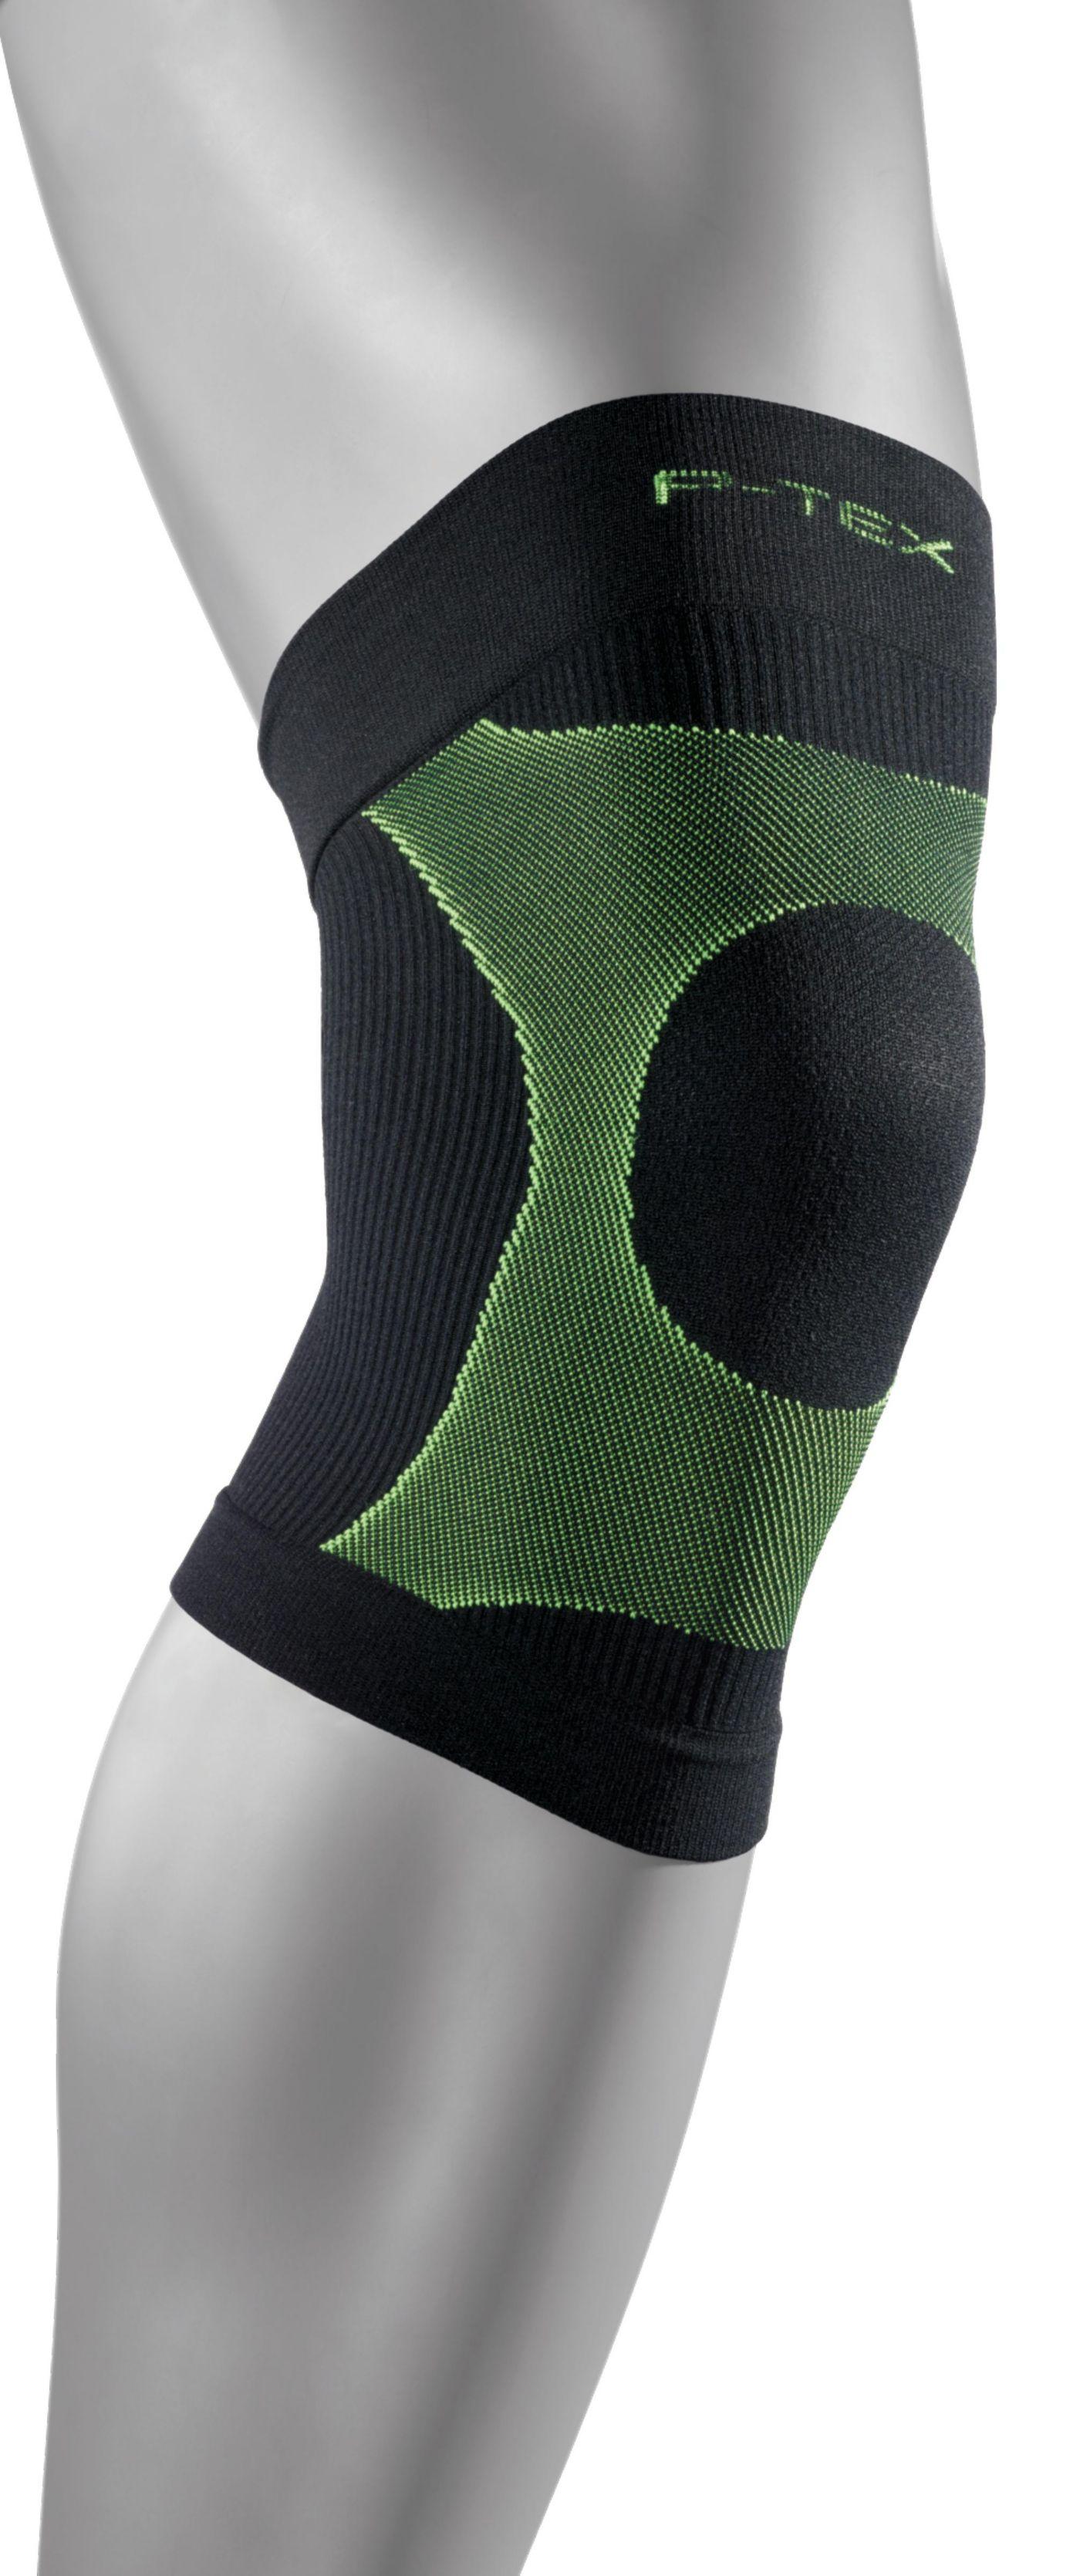 P-TEX Knit Compression Knee Sleeve